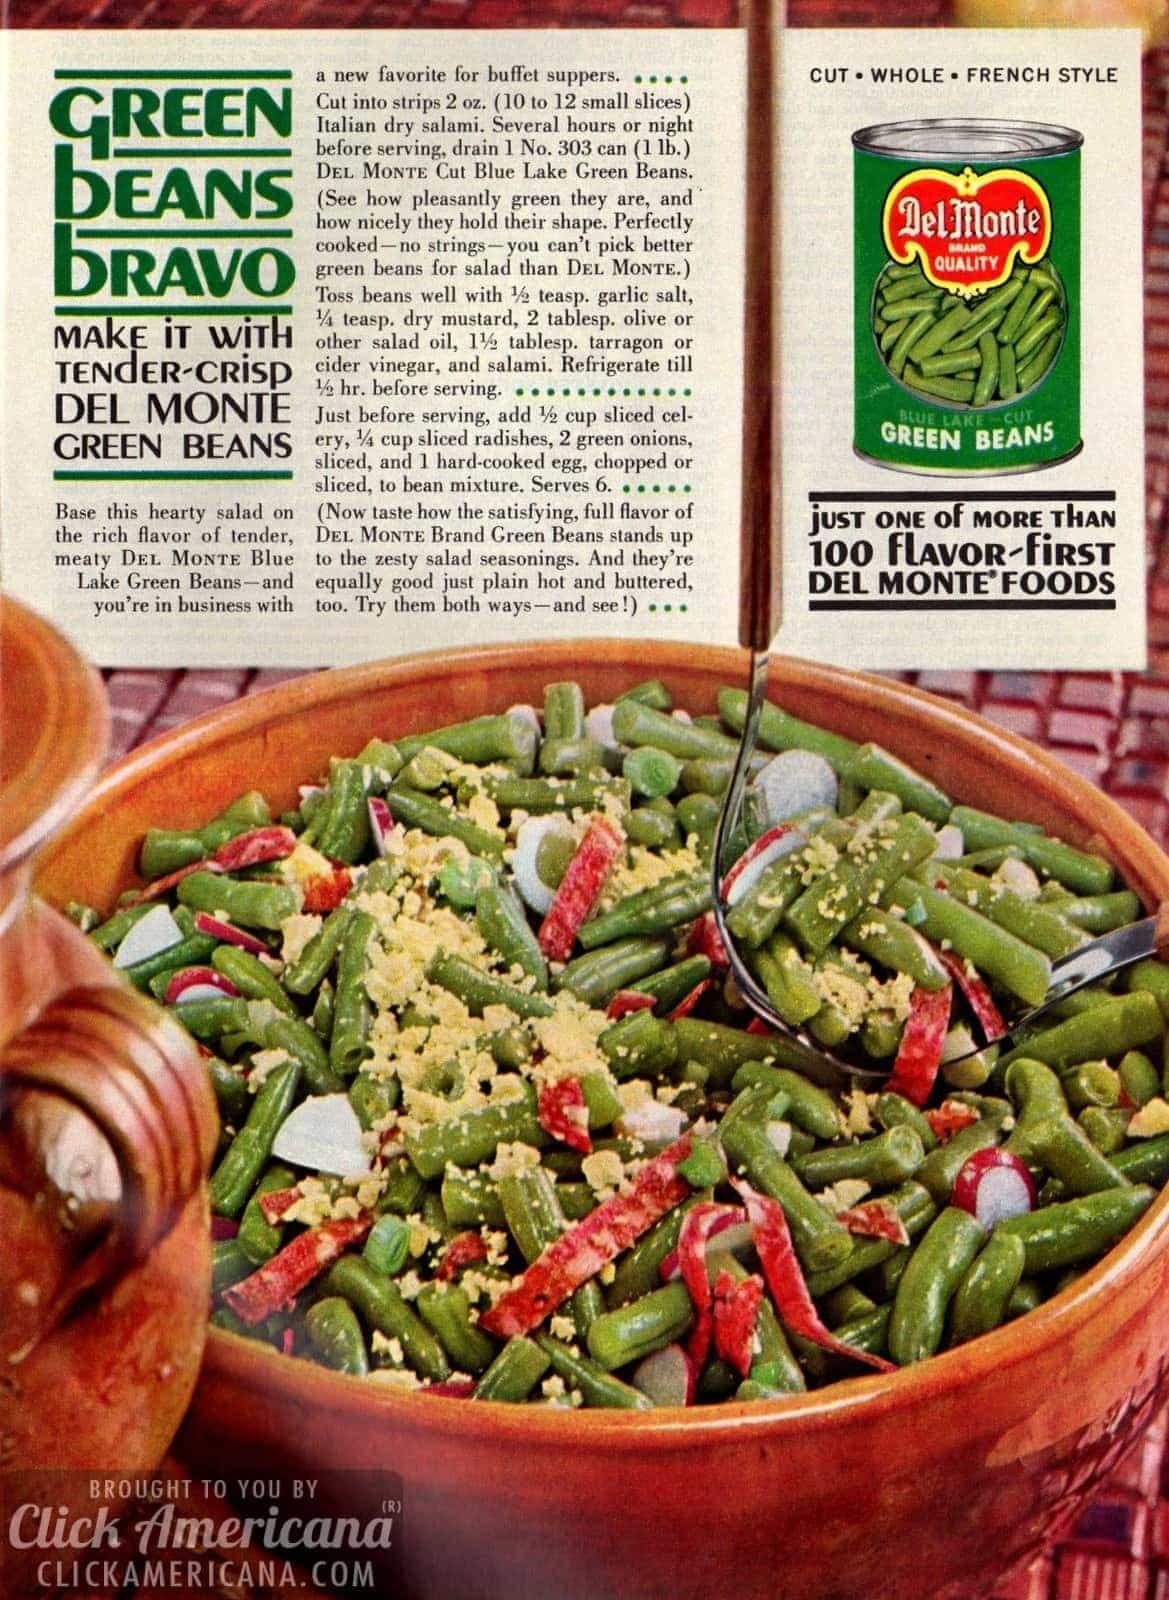 GREEN BEANS BRAVO 1961 CLICK AMERICANA